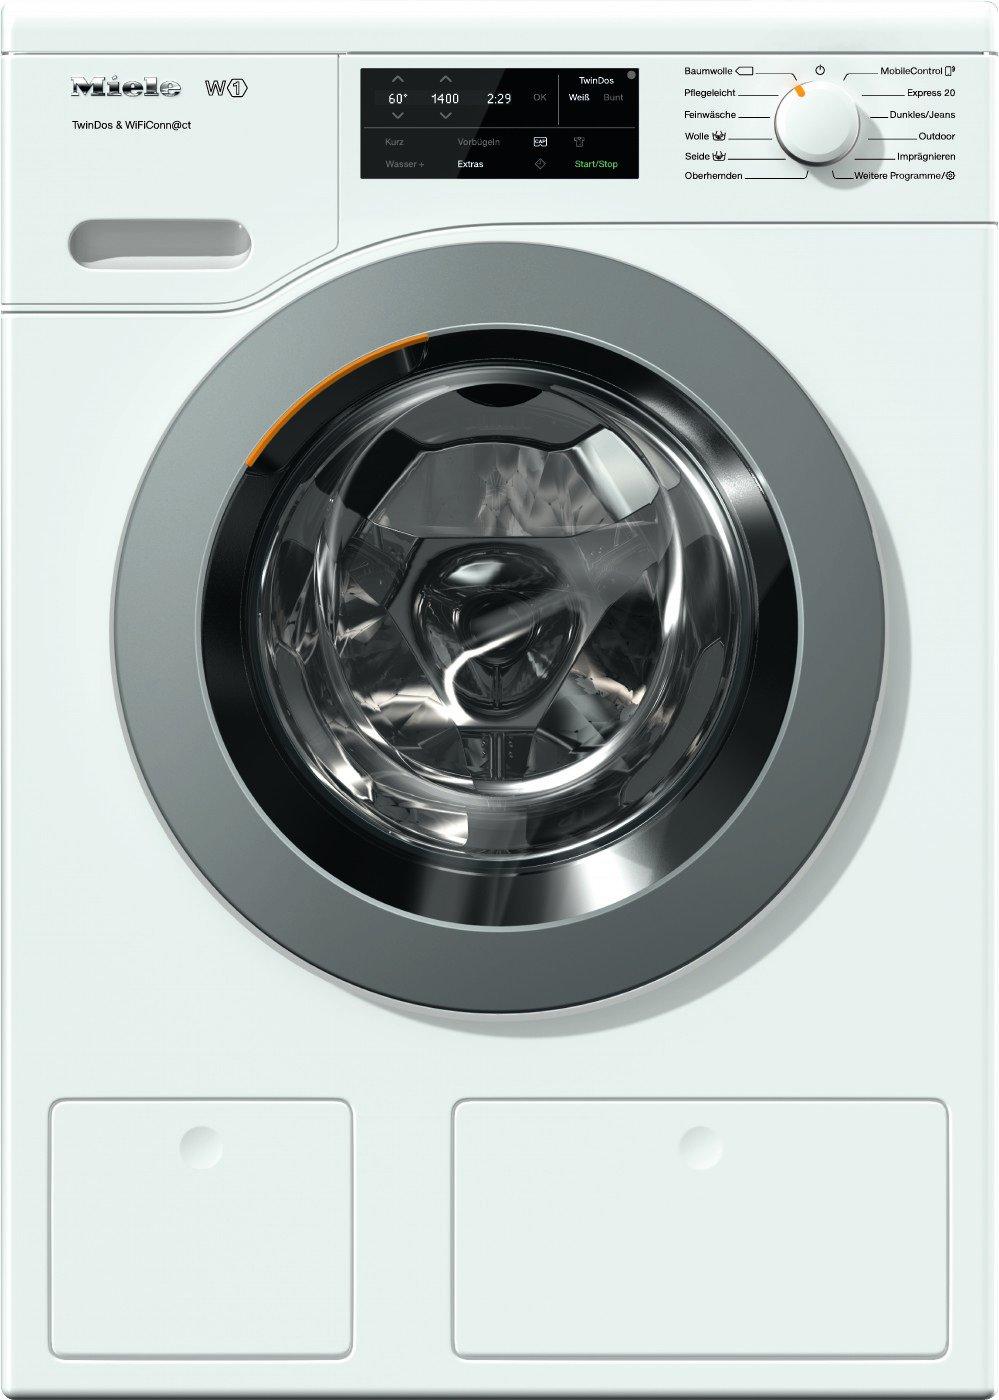 Miele-WCE-TDosWiFi-Waschmaschine-FrontladerA1400-UpM8-kgTwinDos